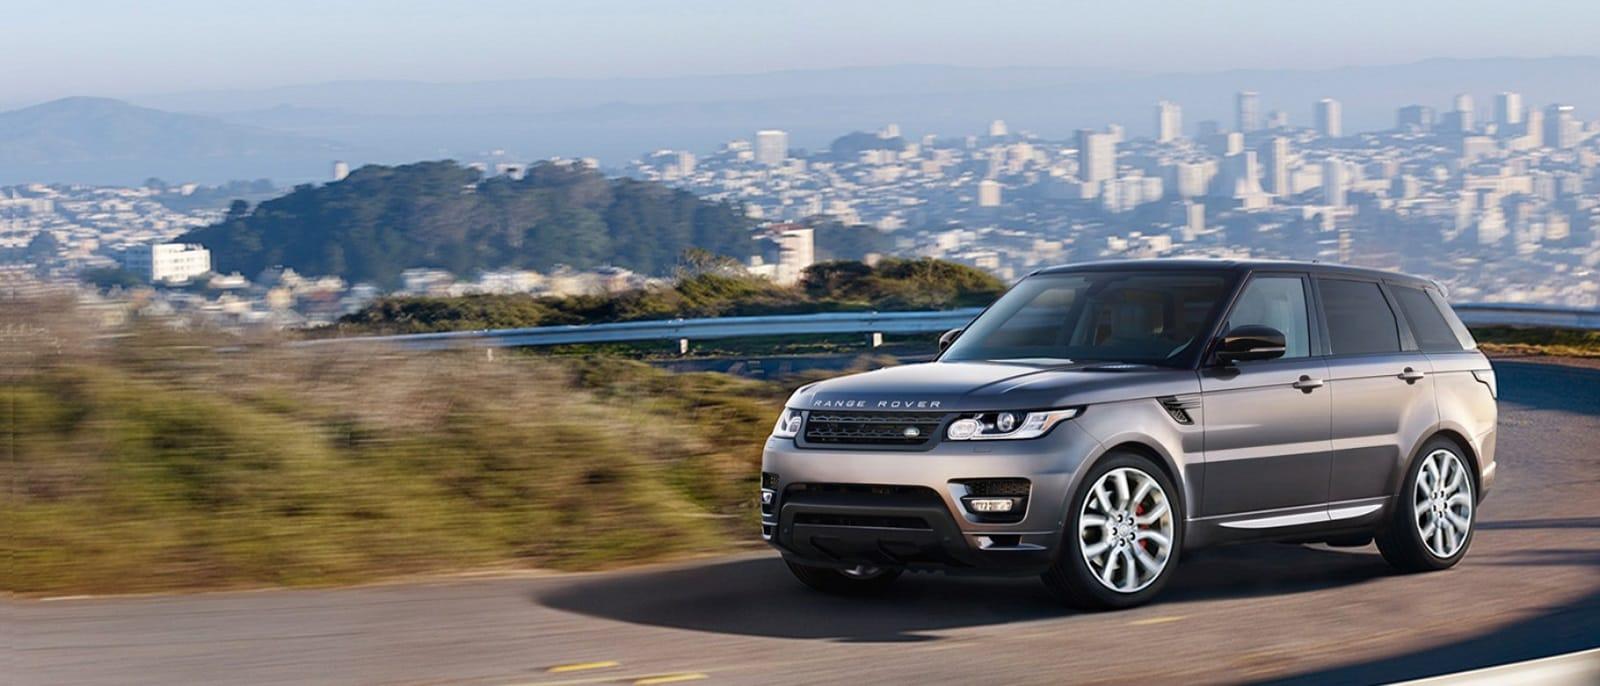 2016-Range-Rover-Sport-Silver